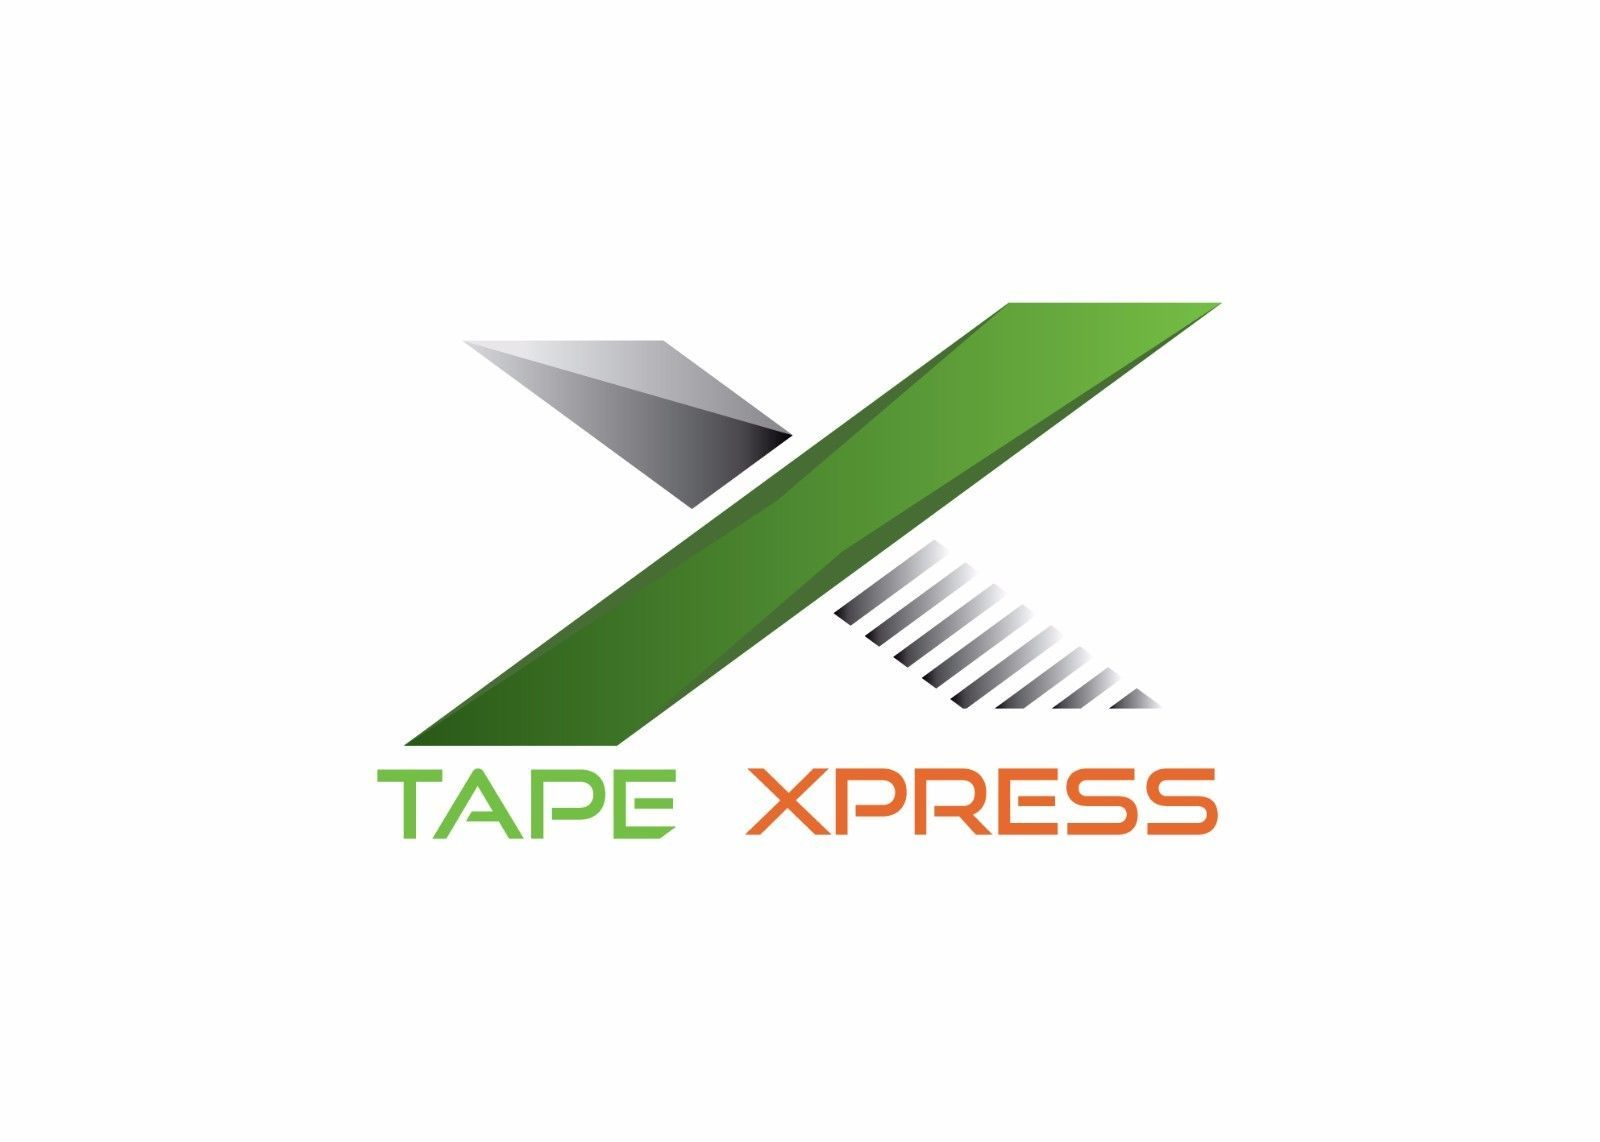 "24 rolls 1/4"" ATG Adhesive Transfer Tape (Fits 3M Gun) Photo Crafts Scrapbooking"